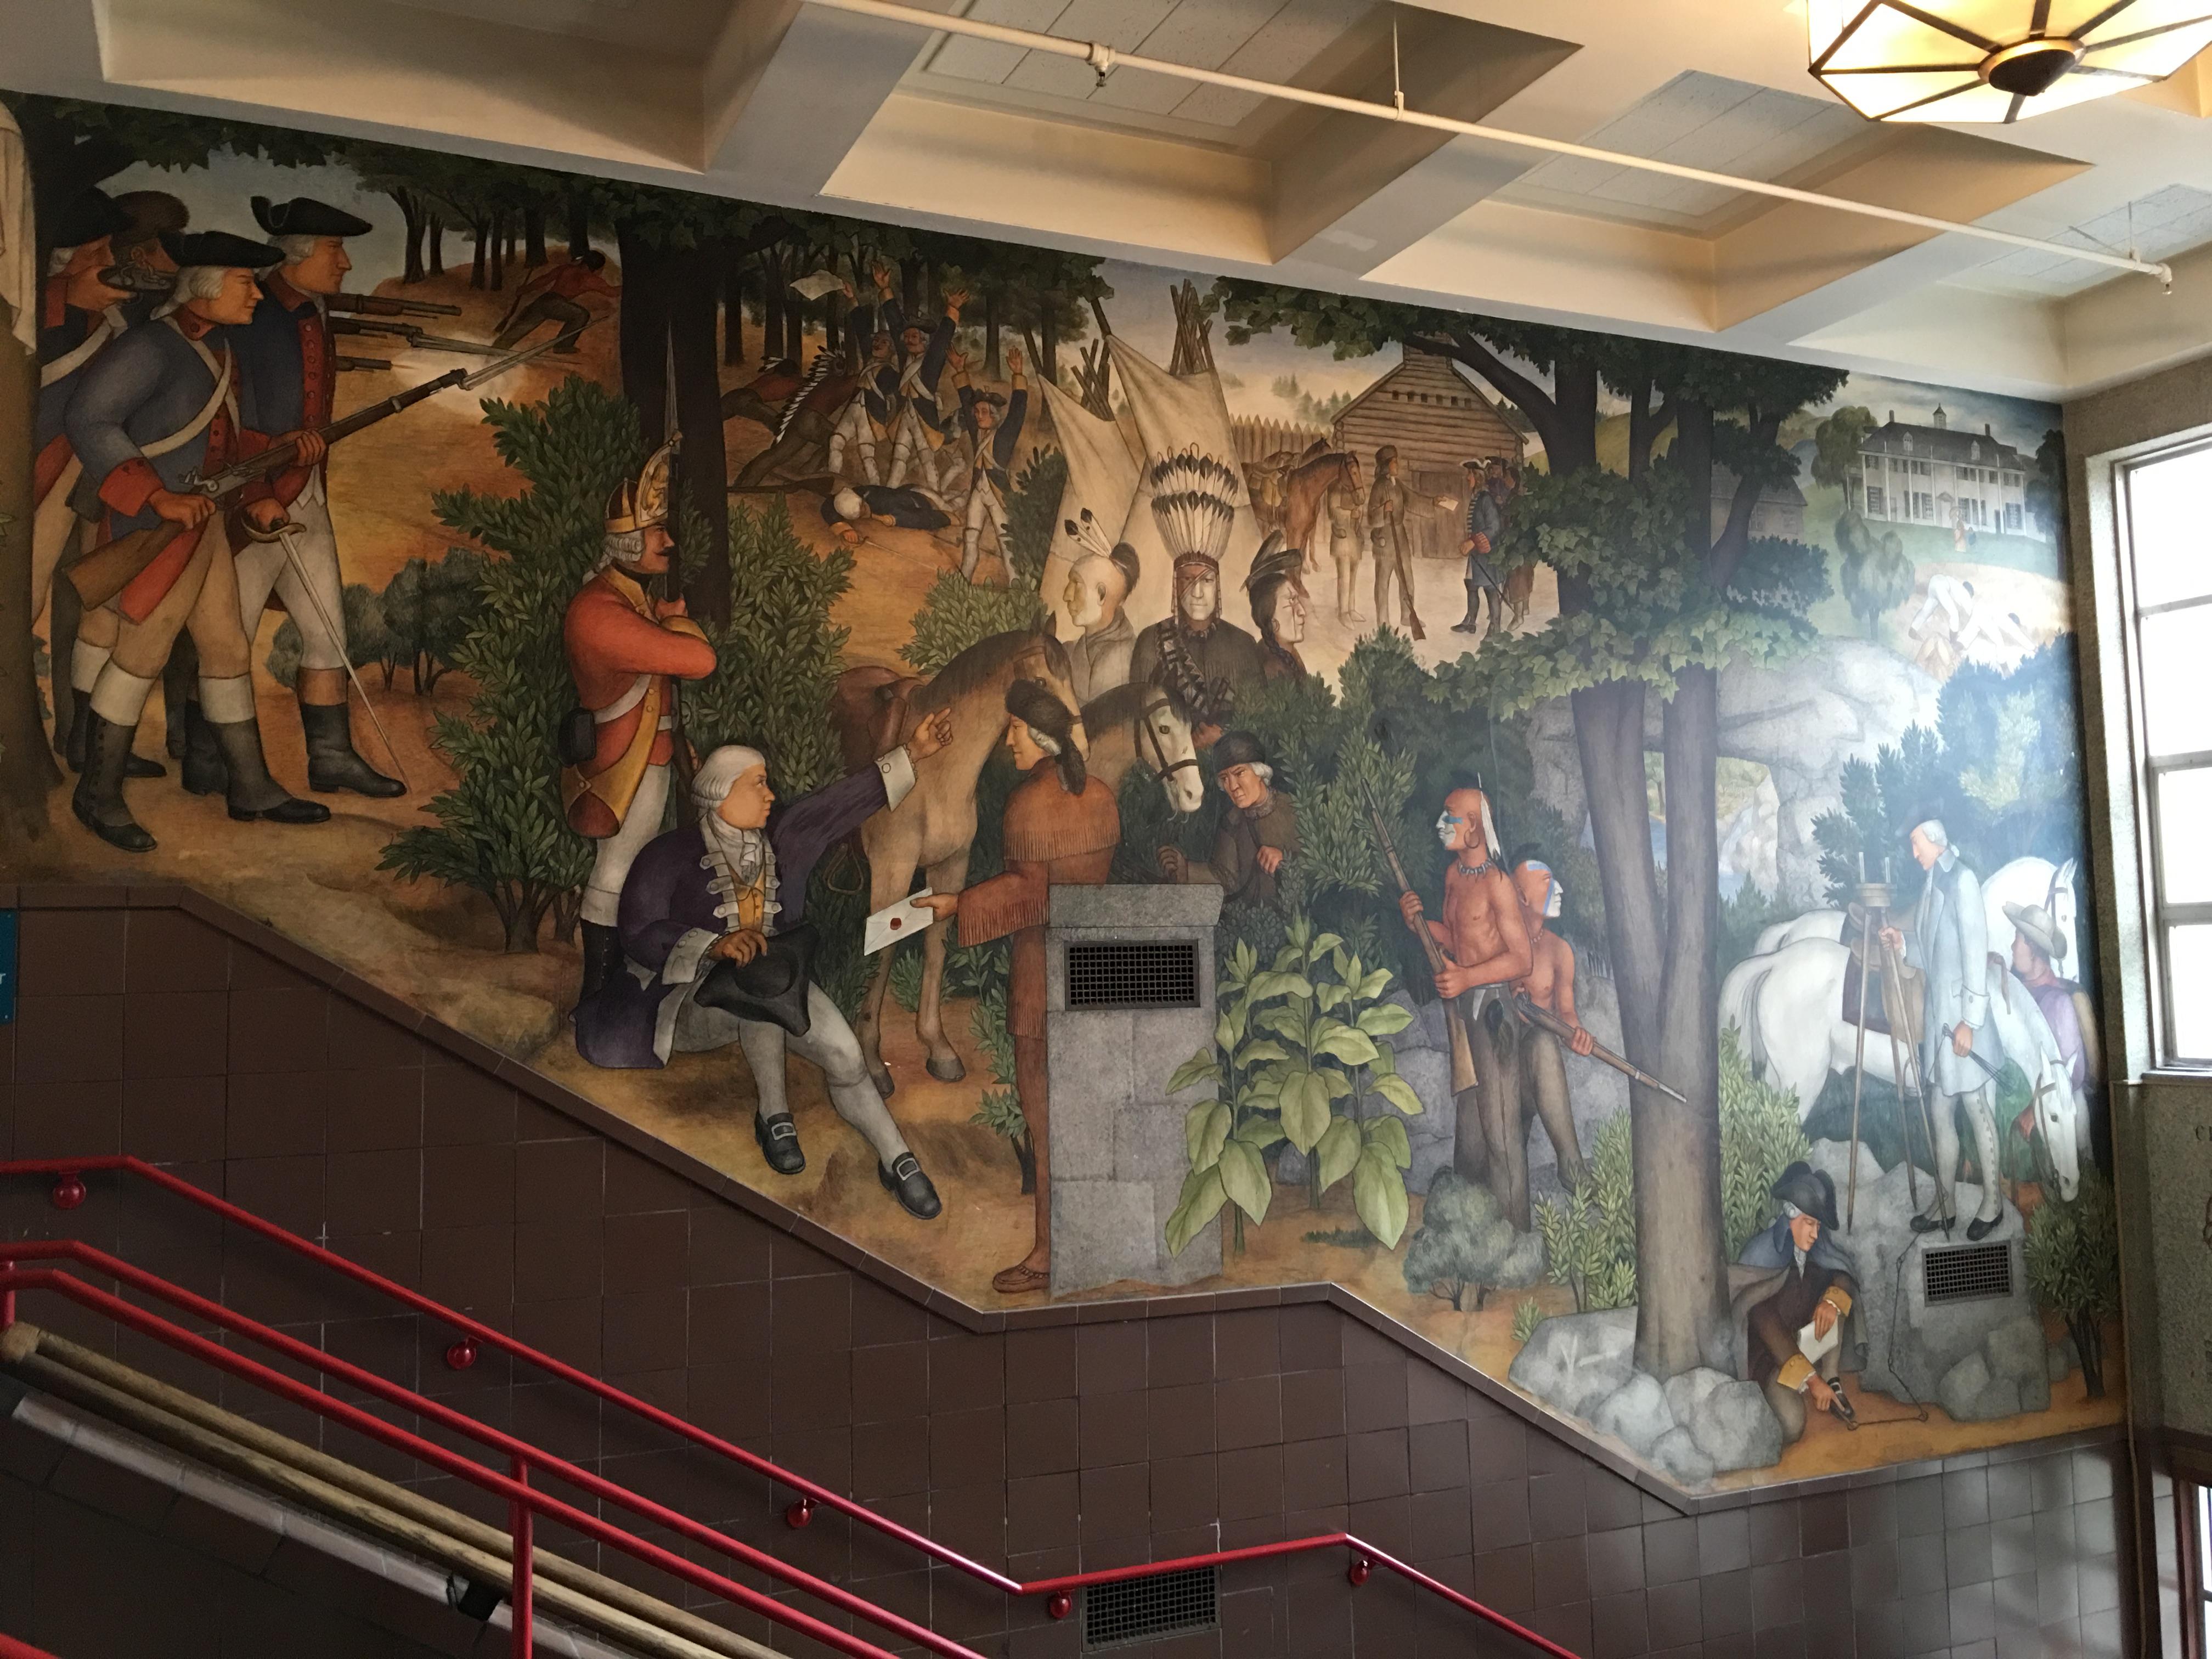 Victor Arnautoff Life of Washington buon fresco murals: Washington's early years. Credit: Tammy Aramian/GWHS Alumni Association.